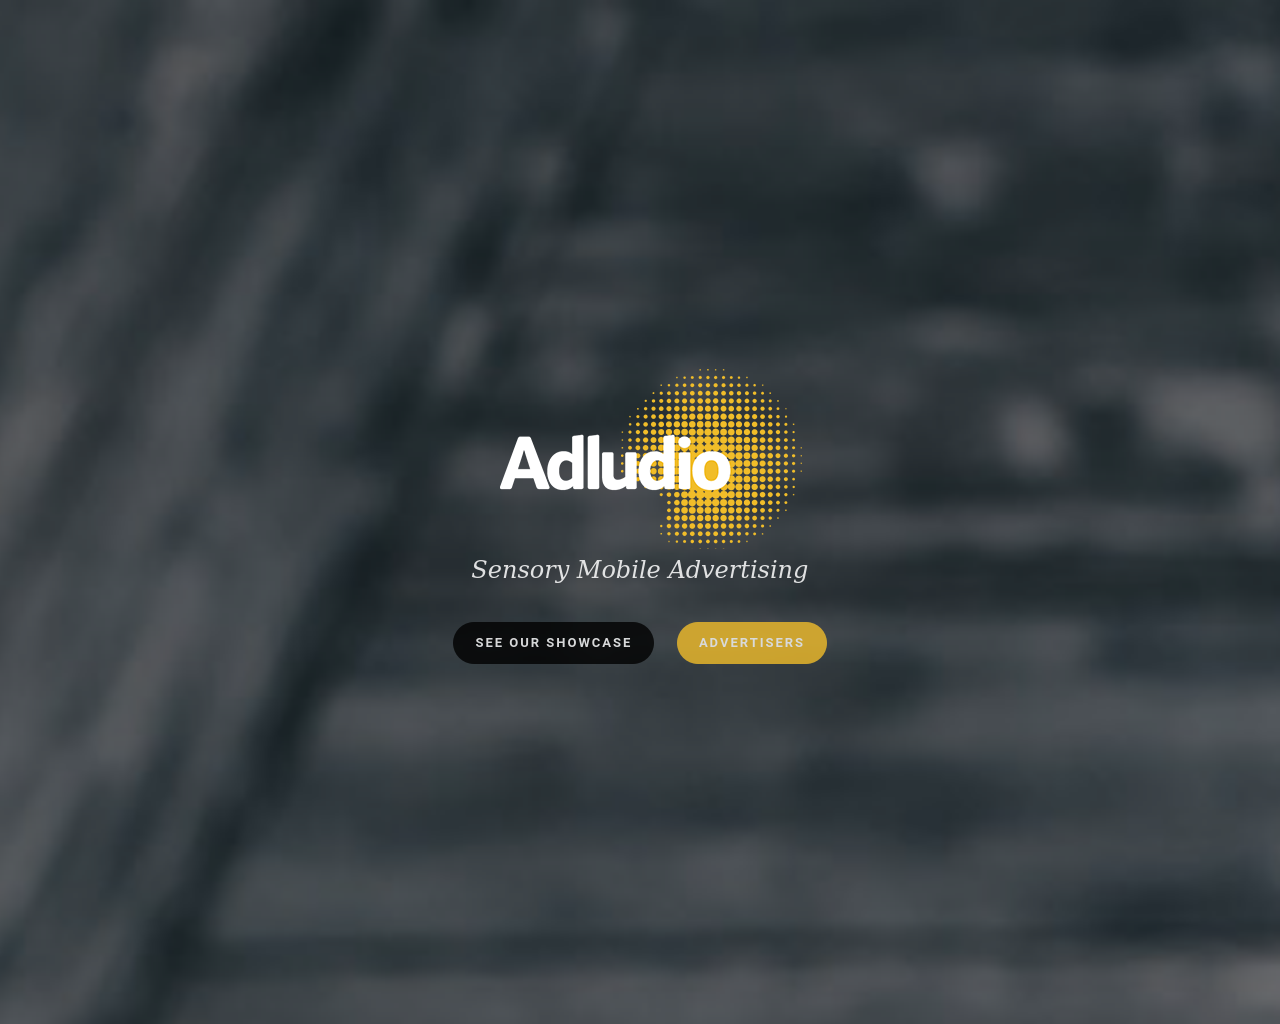 Adludio-Advertising-Reviews-Pricing